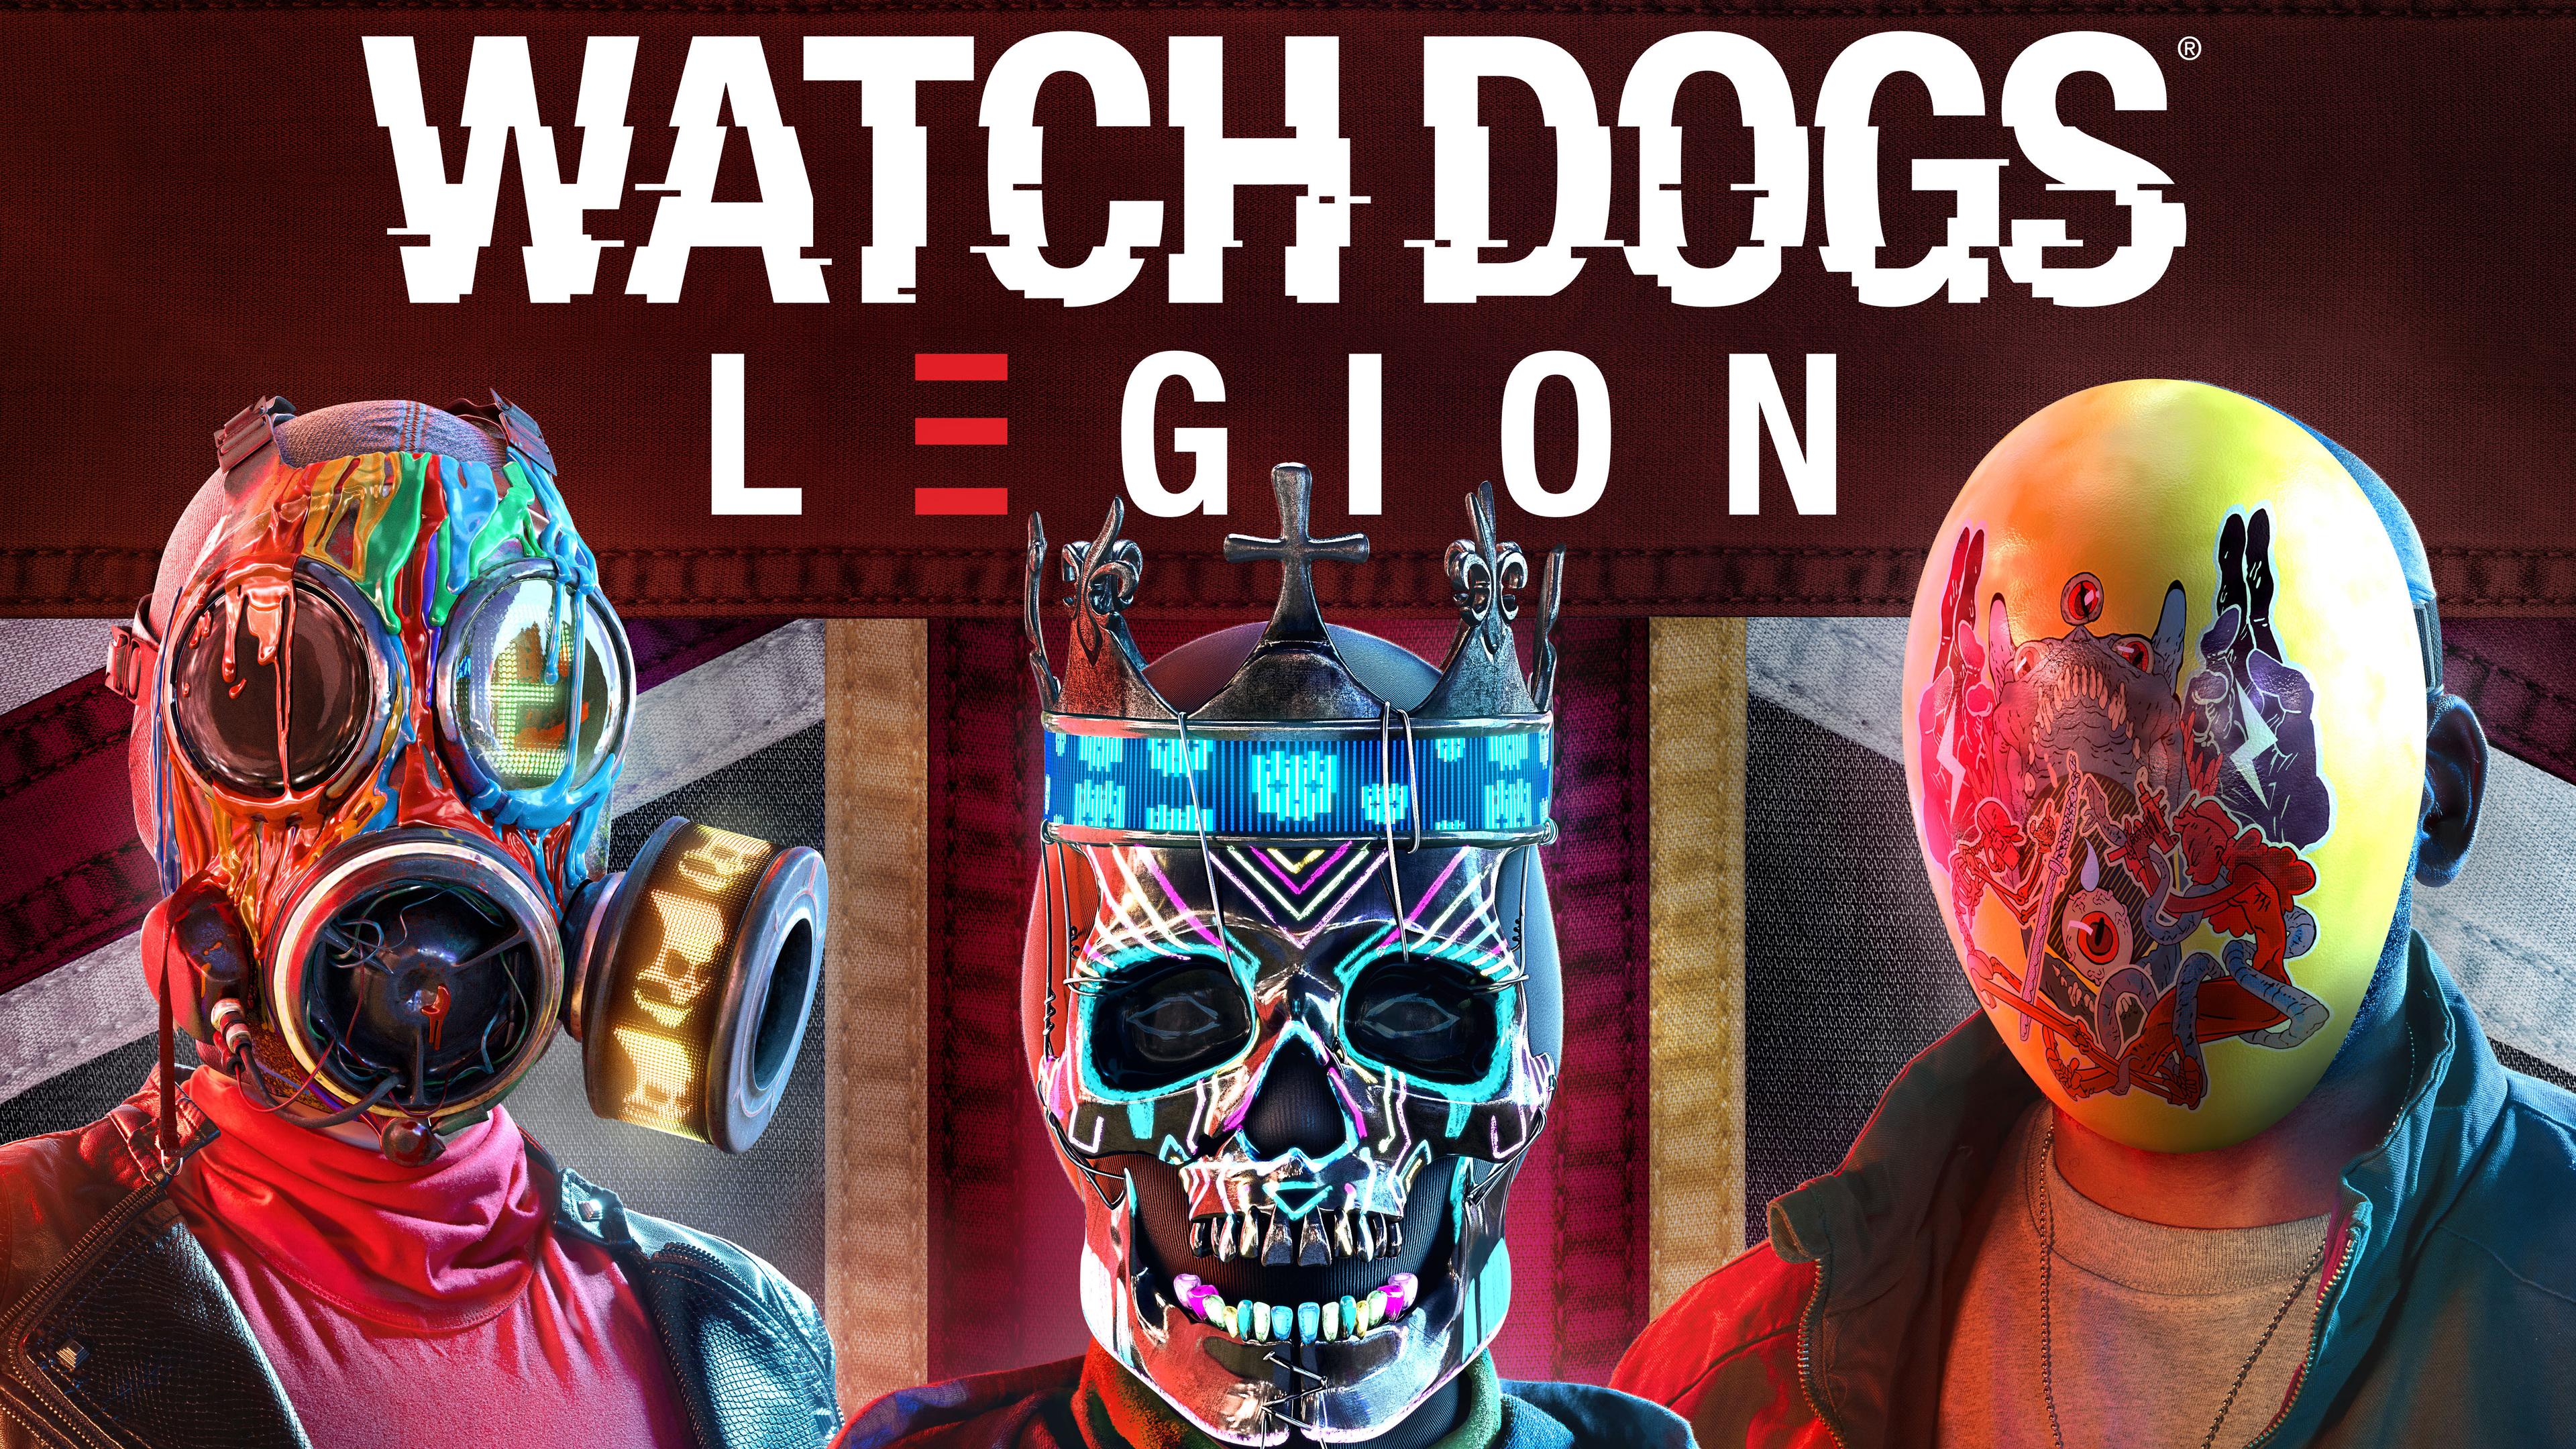 watch dogs legion 2020 1562106653 - Watch Dogs Legion 2020 - watch dogs wallpapers, watch dogs legion wallpapers, watch dogs 3 wallpapers, hd-wallpapers, games wallpapers, 5k wallpapers, 4k-wallpapers, 2019 games wallpapers